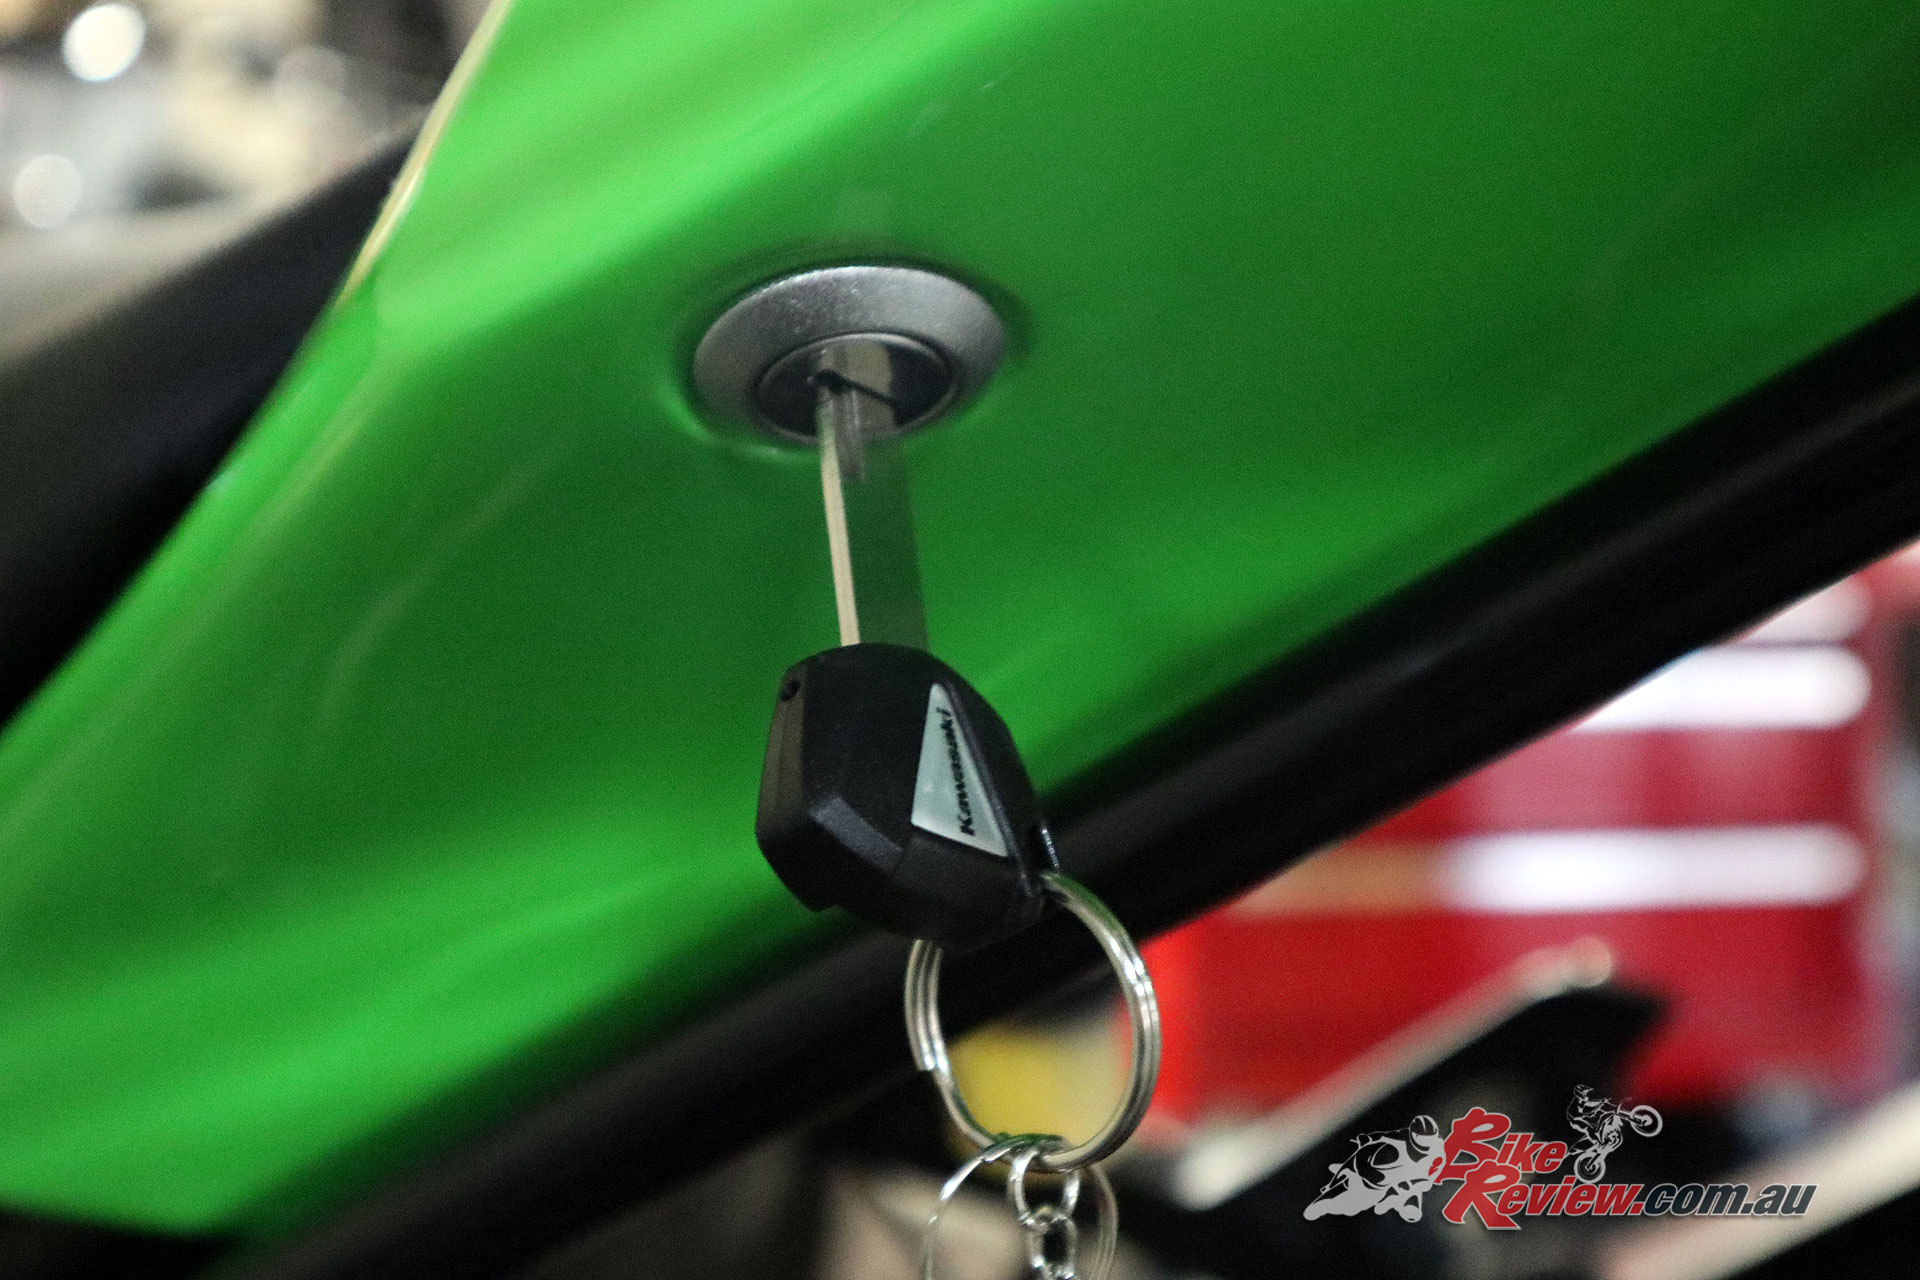 Long Term: Ninja 400 Oggy Knobbs Fitment - Bike Review